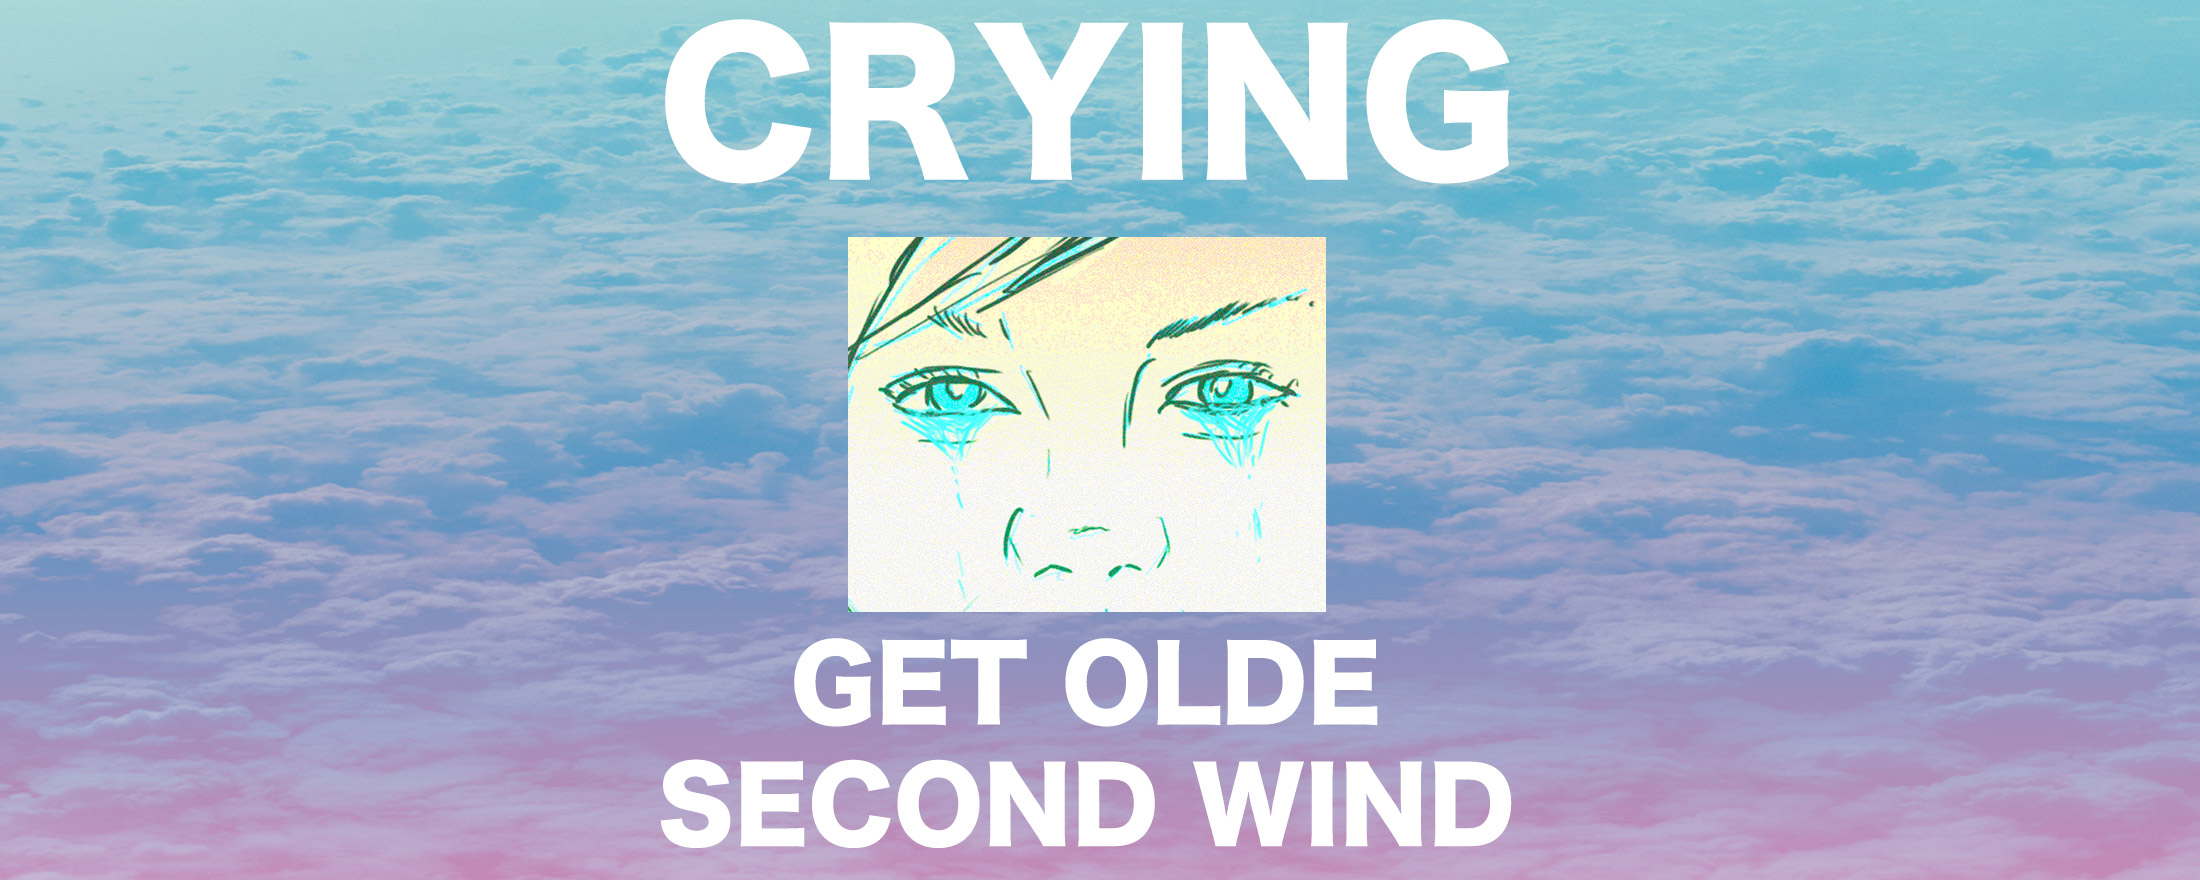 CryingR